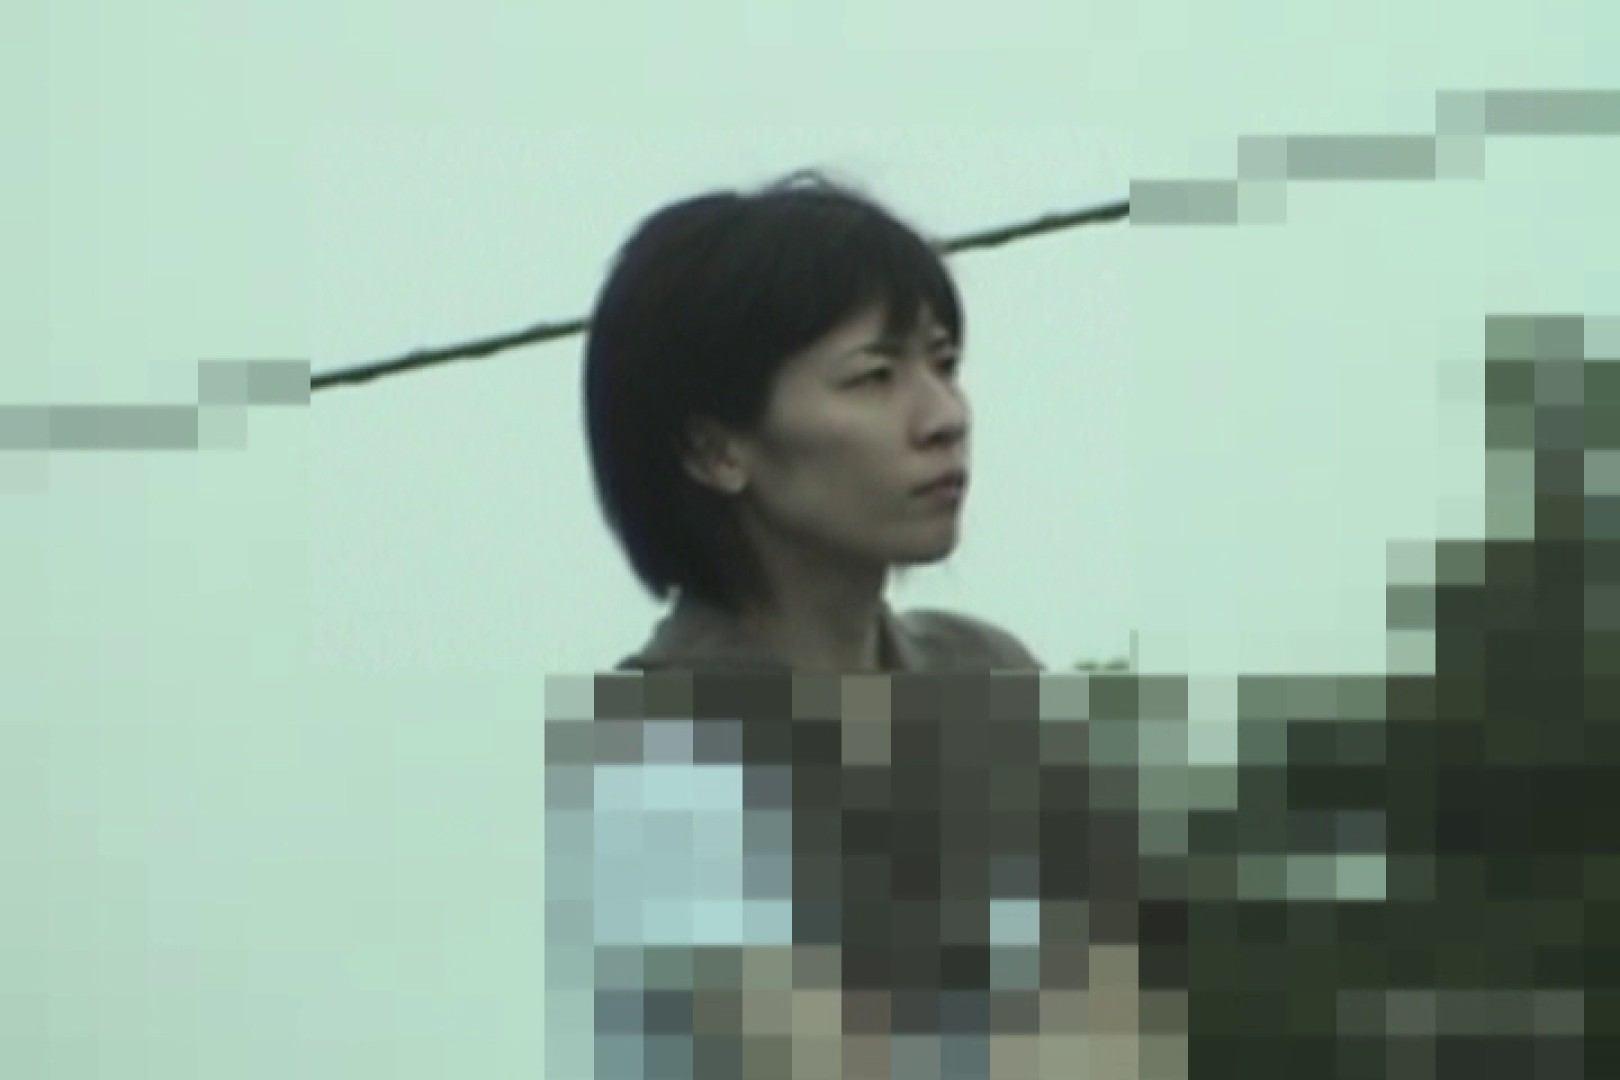 Aquaな露天風呂Vol.793 盗撮特撮   OLのプライベート  10pic 1